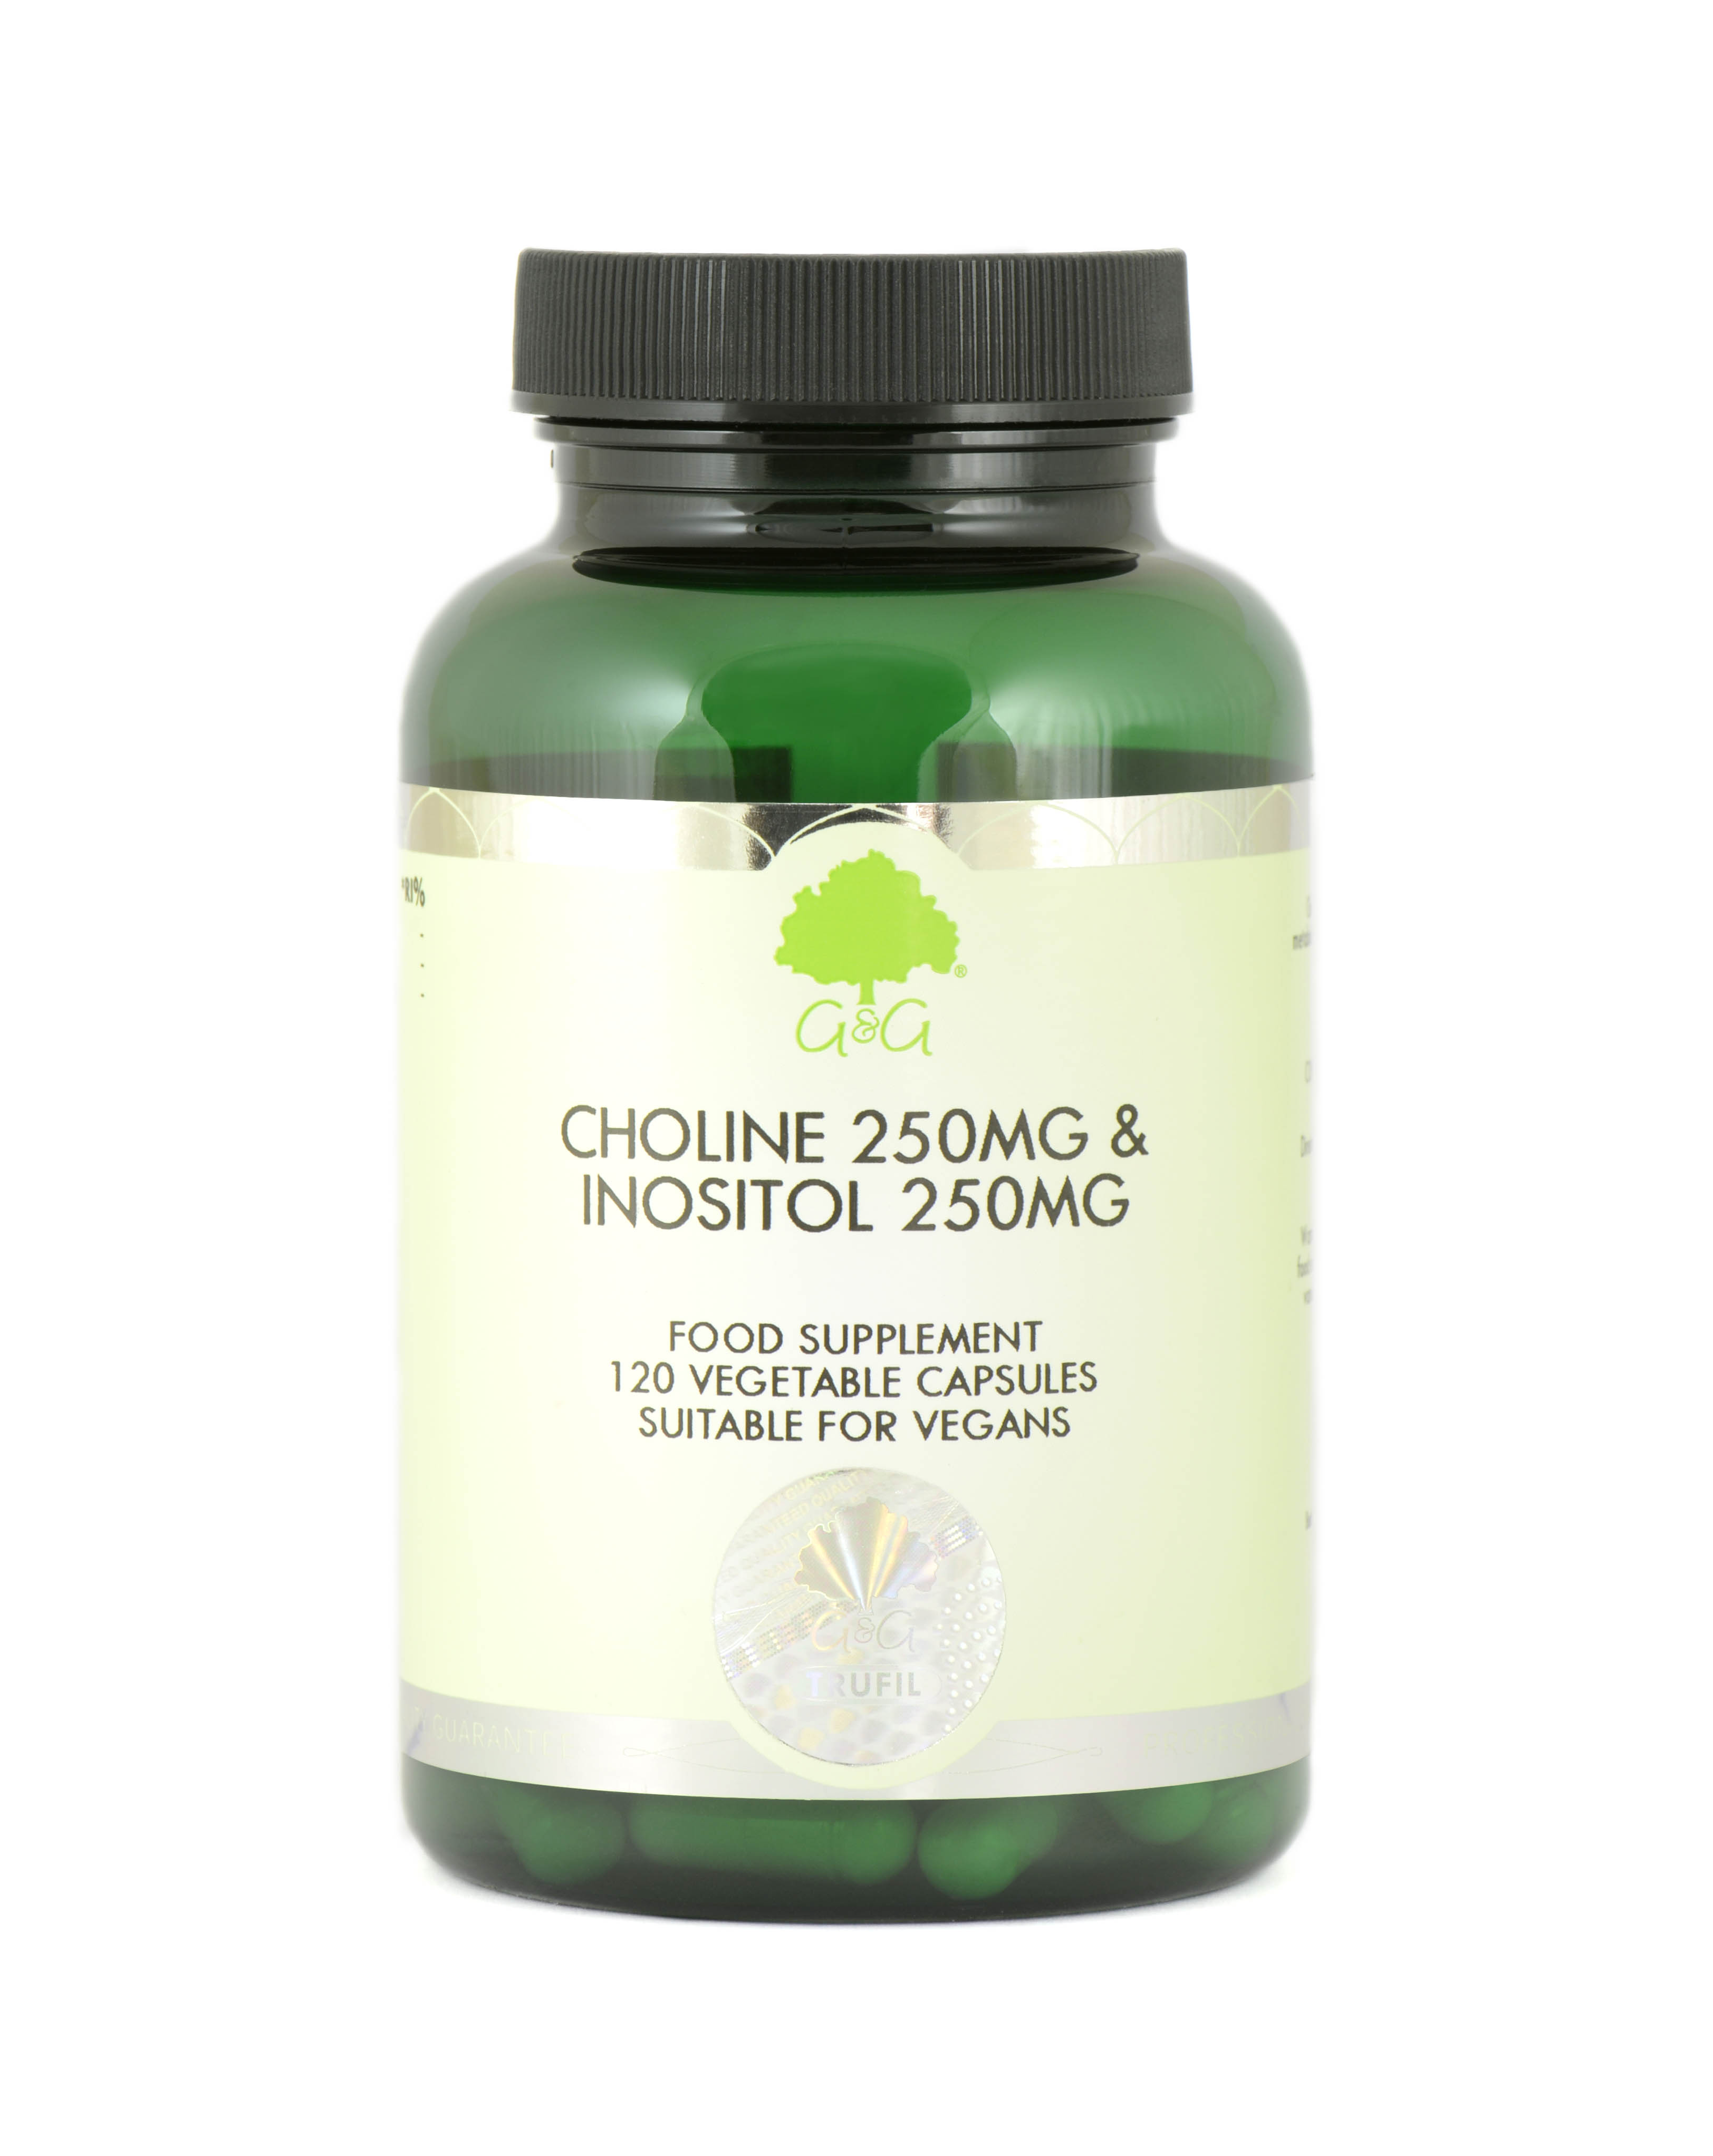 Choline 250mg & Inositol 250mg 120's